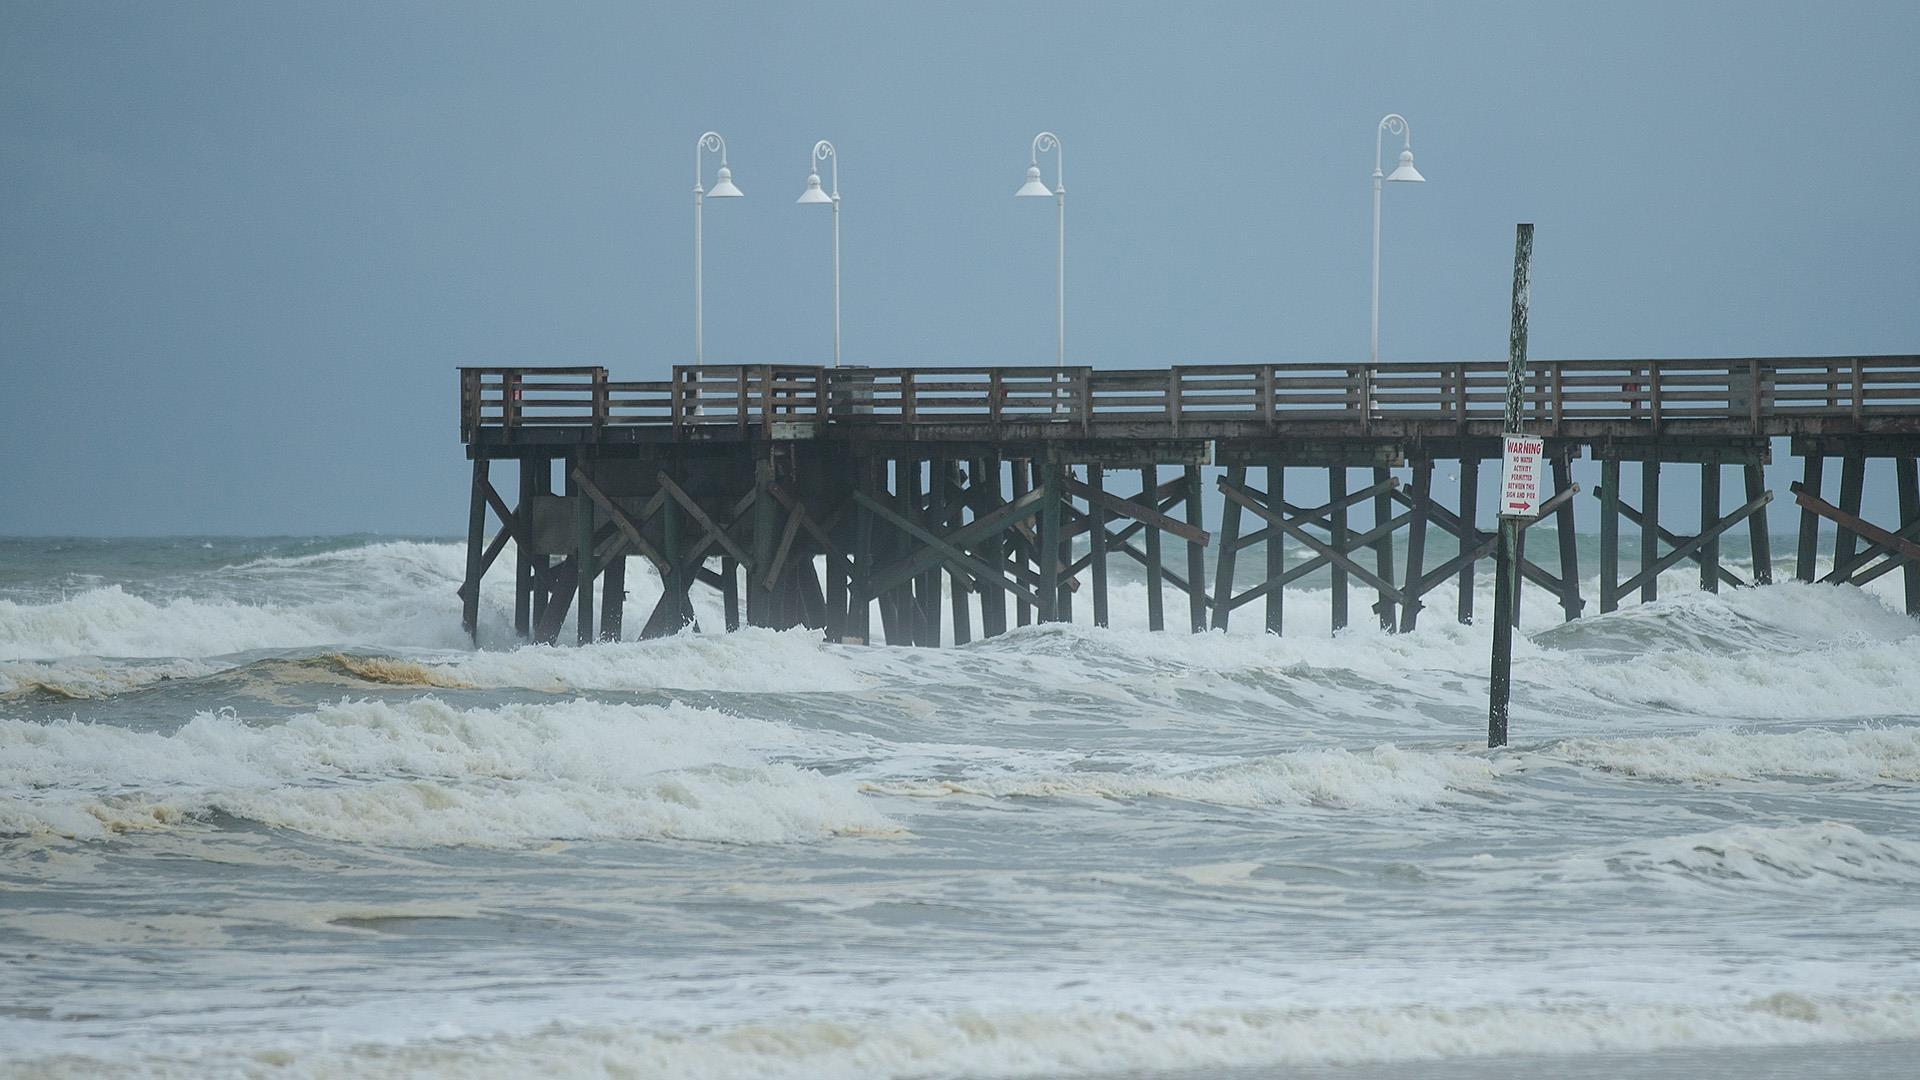 Hurricane Matthew Storm Surge Floods Highway Along Daytona Beach Nbc News